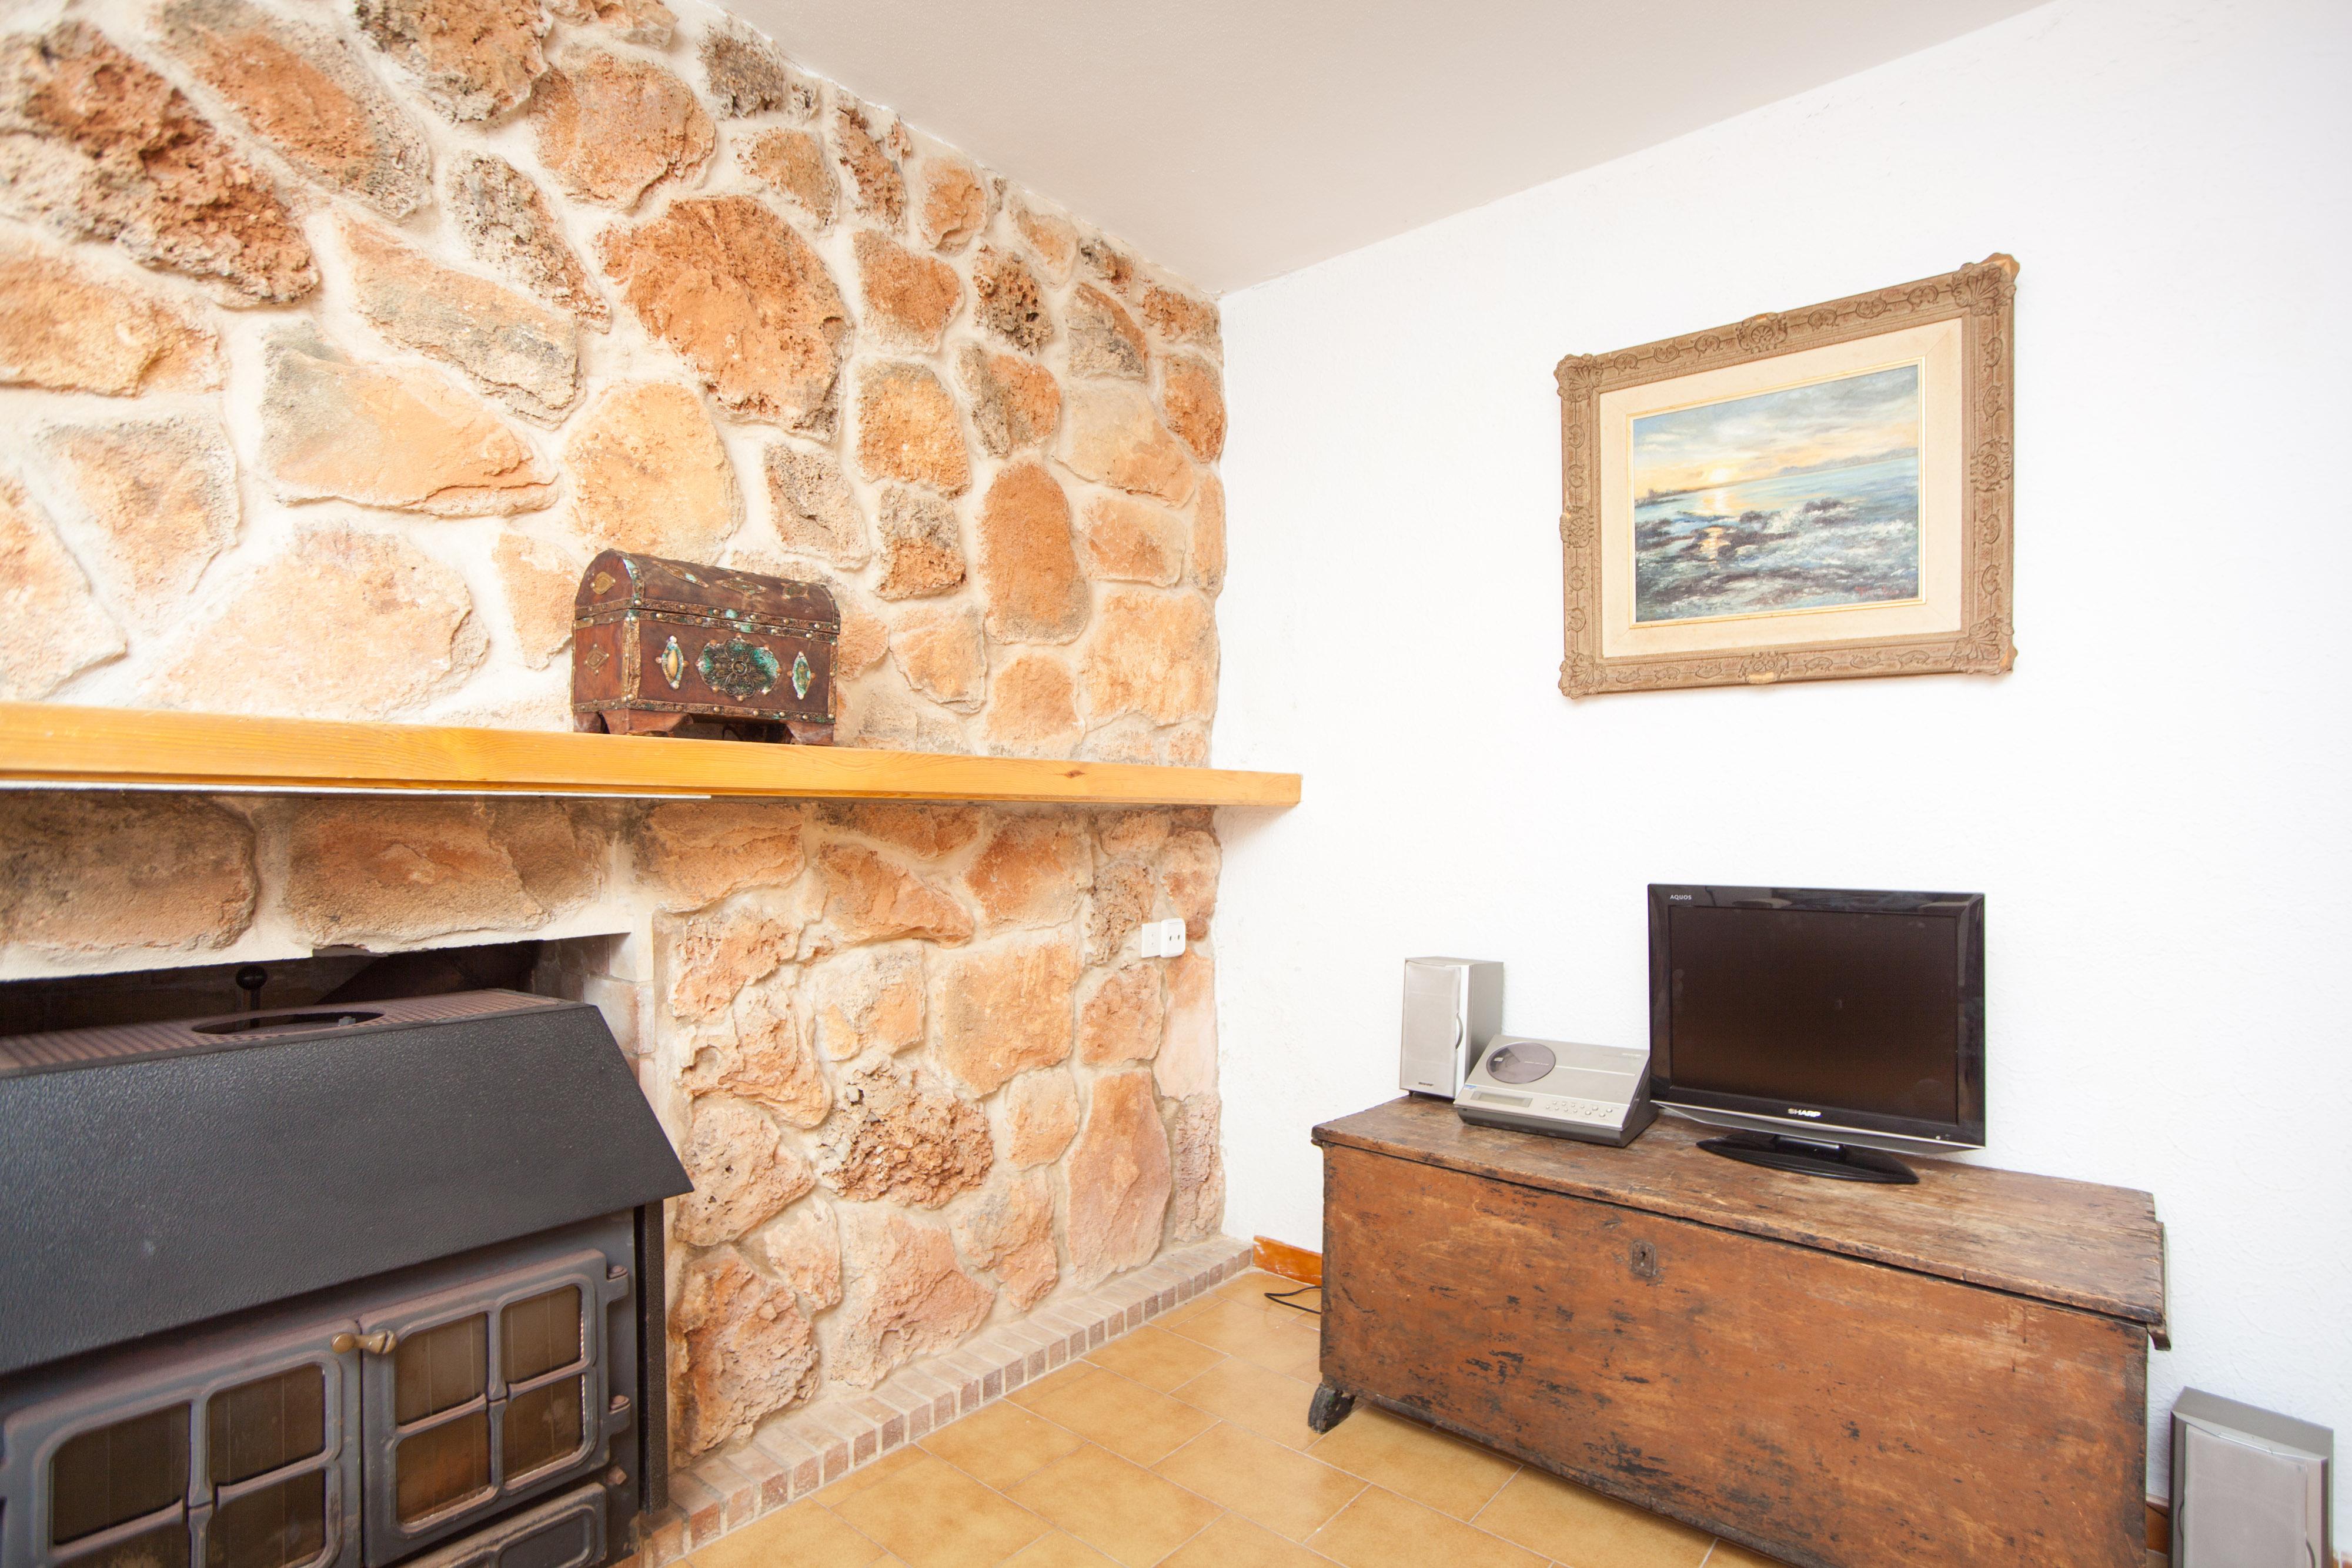 Ferienhaus CAN CUSSÓ SANSÓ (2198042), Colonia de Sant Pere, Mallorca, Balearische Inseln, Spanien, Bild 22